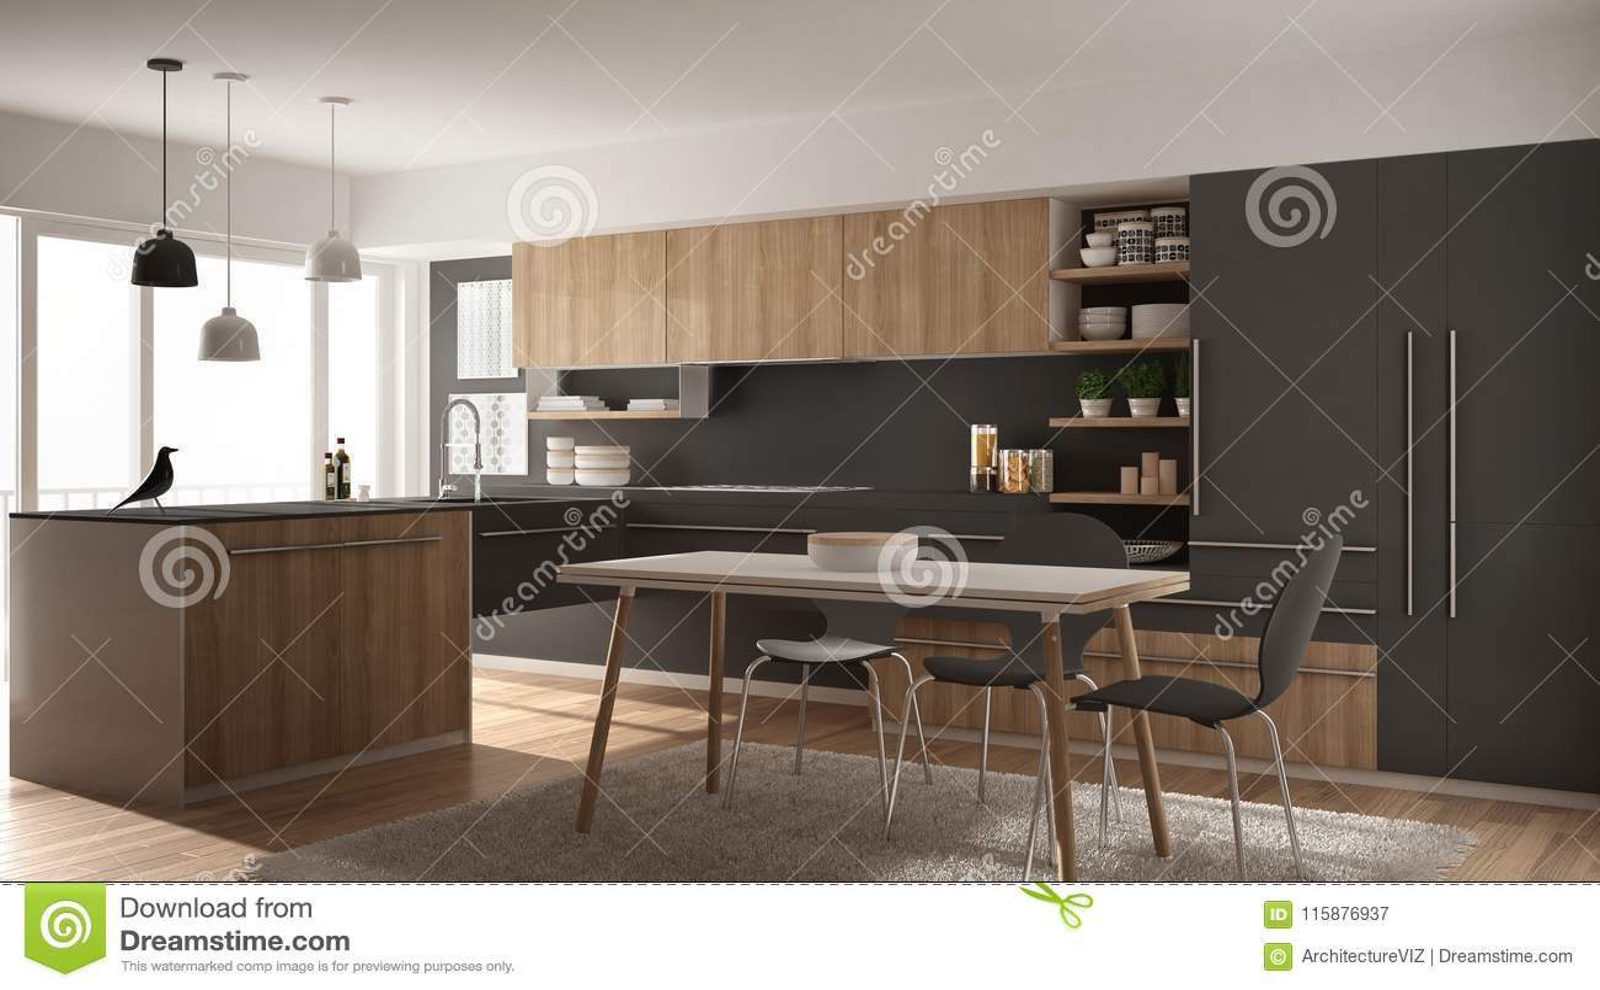 grey kitchen rugs redo ideas 有餐桌 地毯和全景窗口 白色和灰色建筑学内部的现代minimalistic木厨房 白色和灰色建筑学室内设计的现代minimalistic木厨房